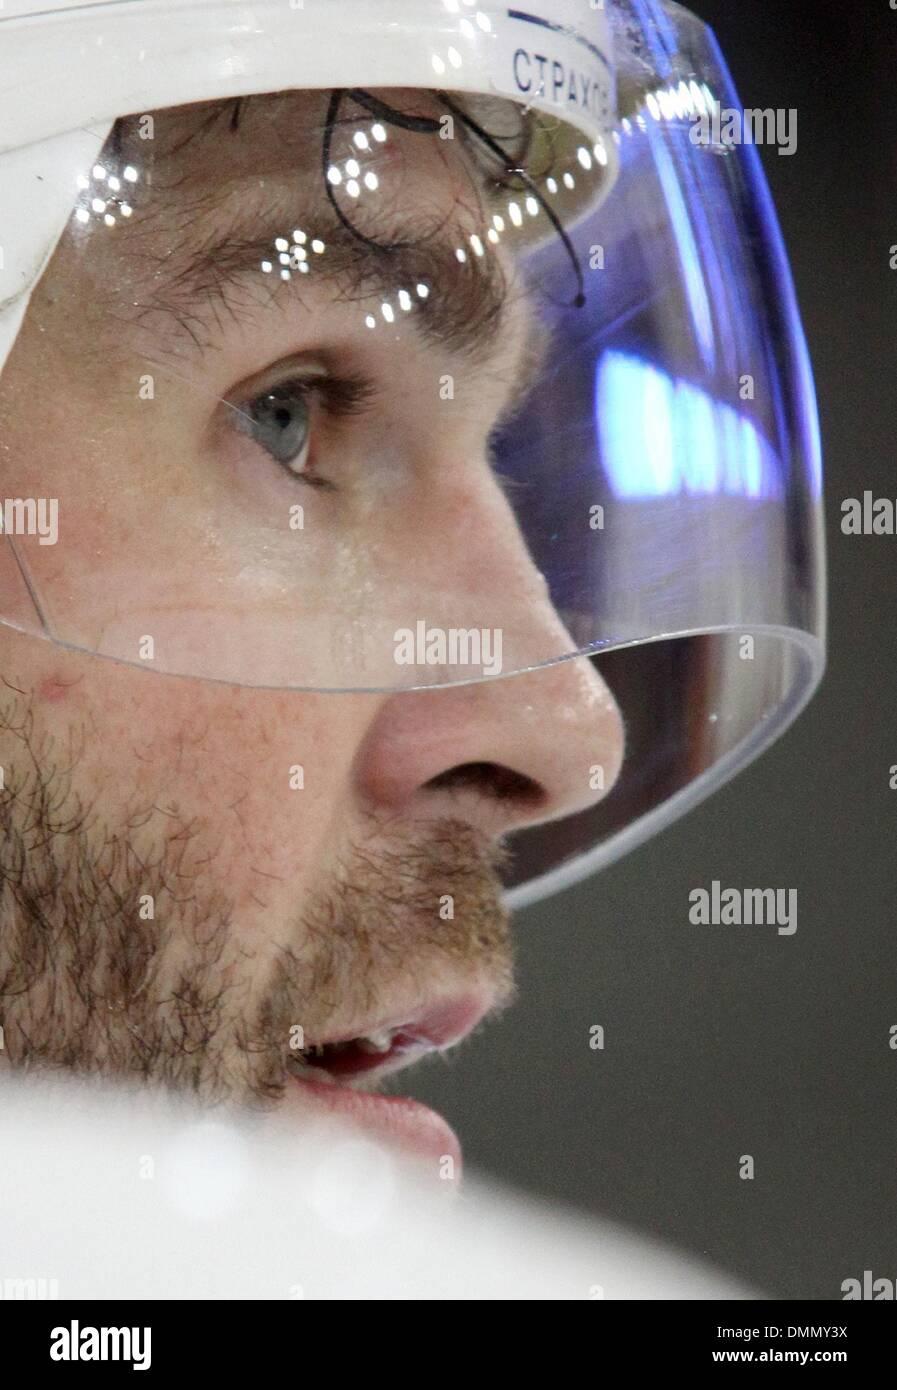 Sep 18, 2009 - Moskau, Russland - ehemalige New York Ranger star JAROMIR JAGR spielt jetzt für internationale professionelle Hockey-Liga KHL (Kontinental Hockey League) mit dem Club Avangard Omsk. (Kredit-Bild: © PhotoXpress/ZUMA Press) Stockbild